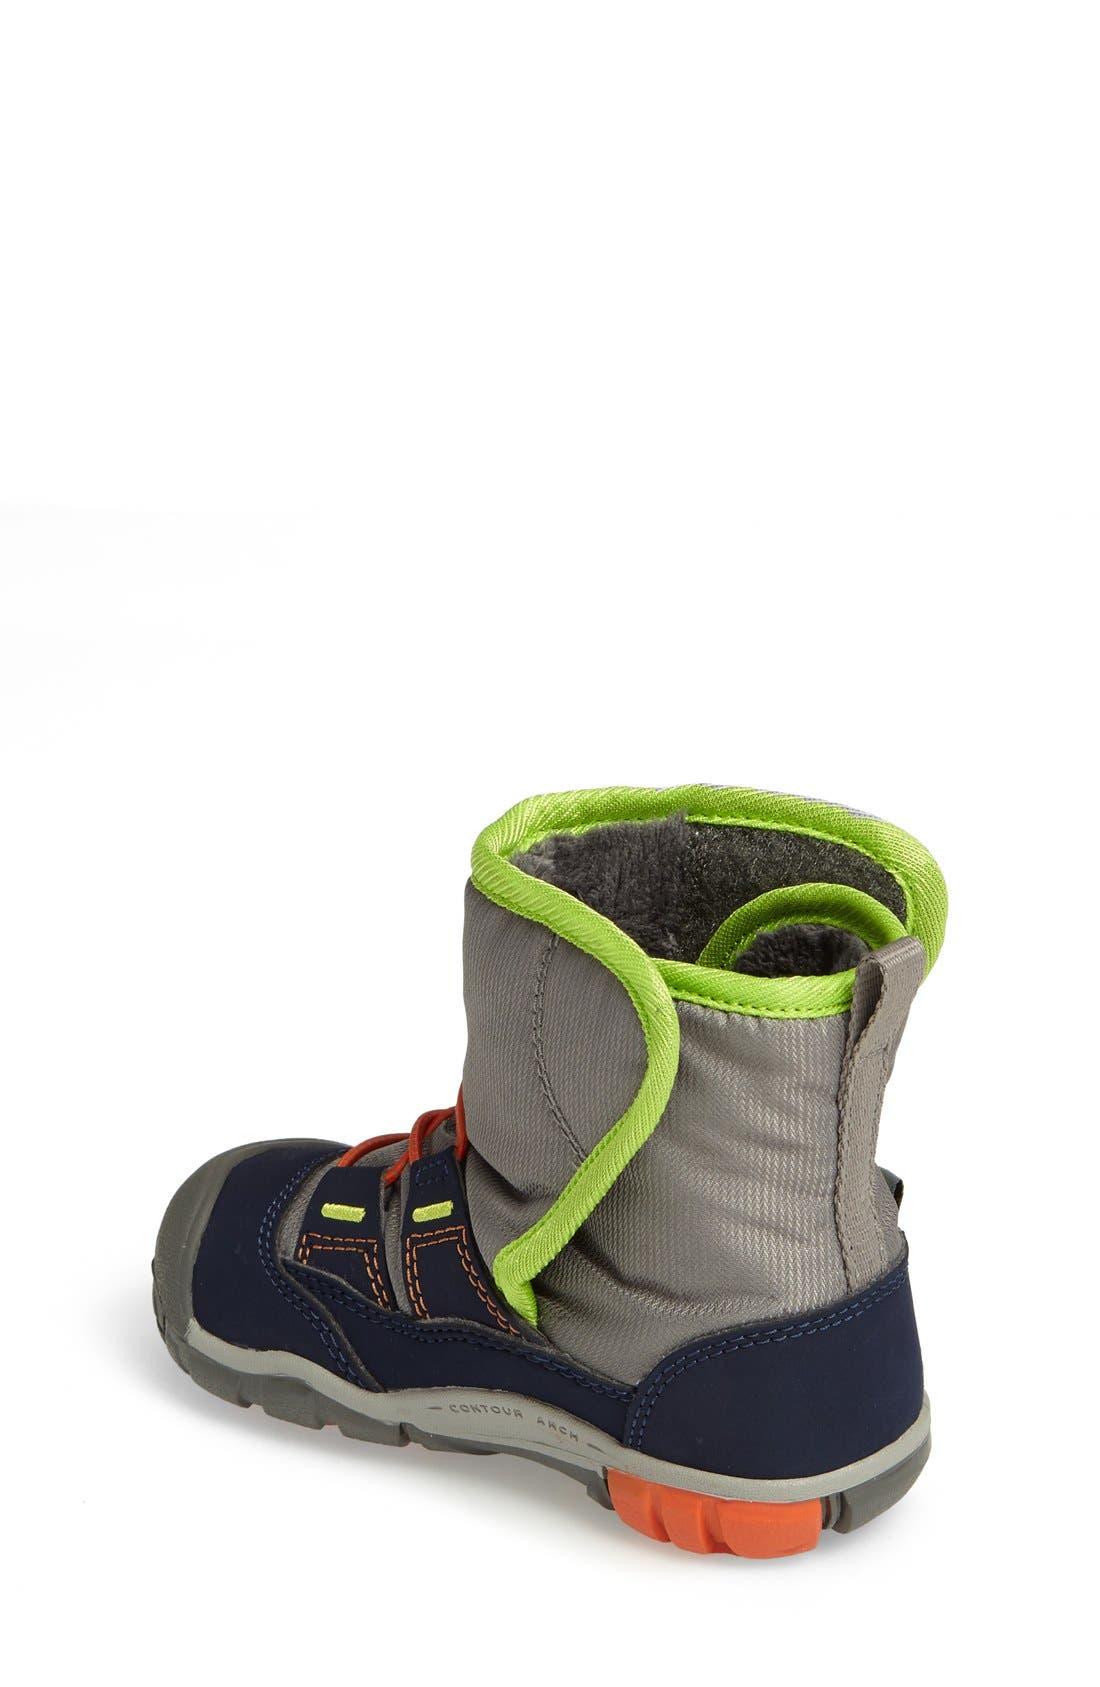 Alternate Image 2  - Keen Peek-A-Boot Fleece Lined Boot (Baby & Walker)